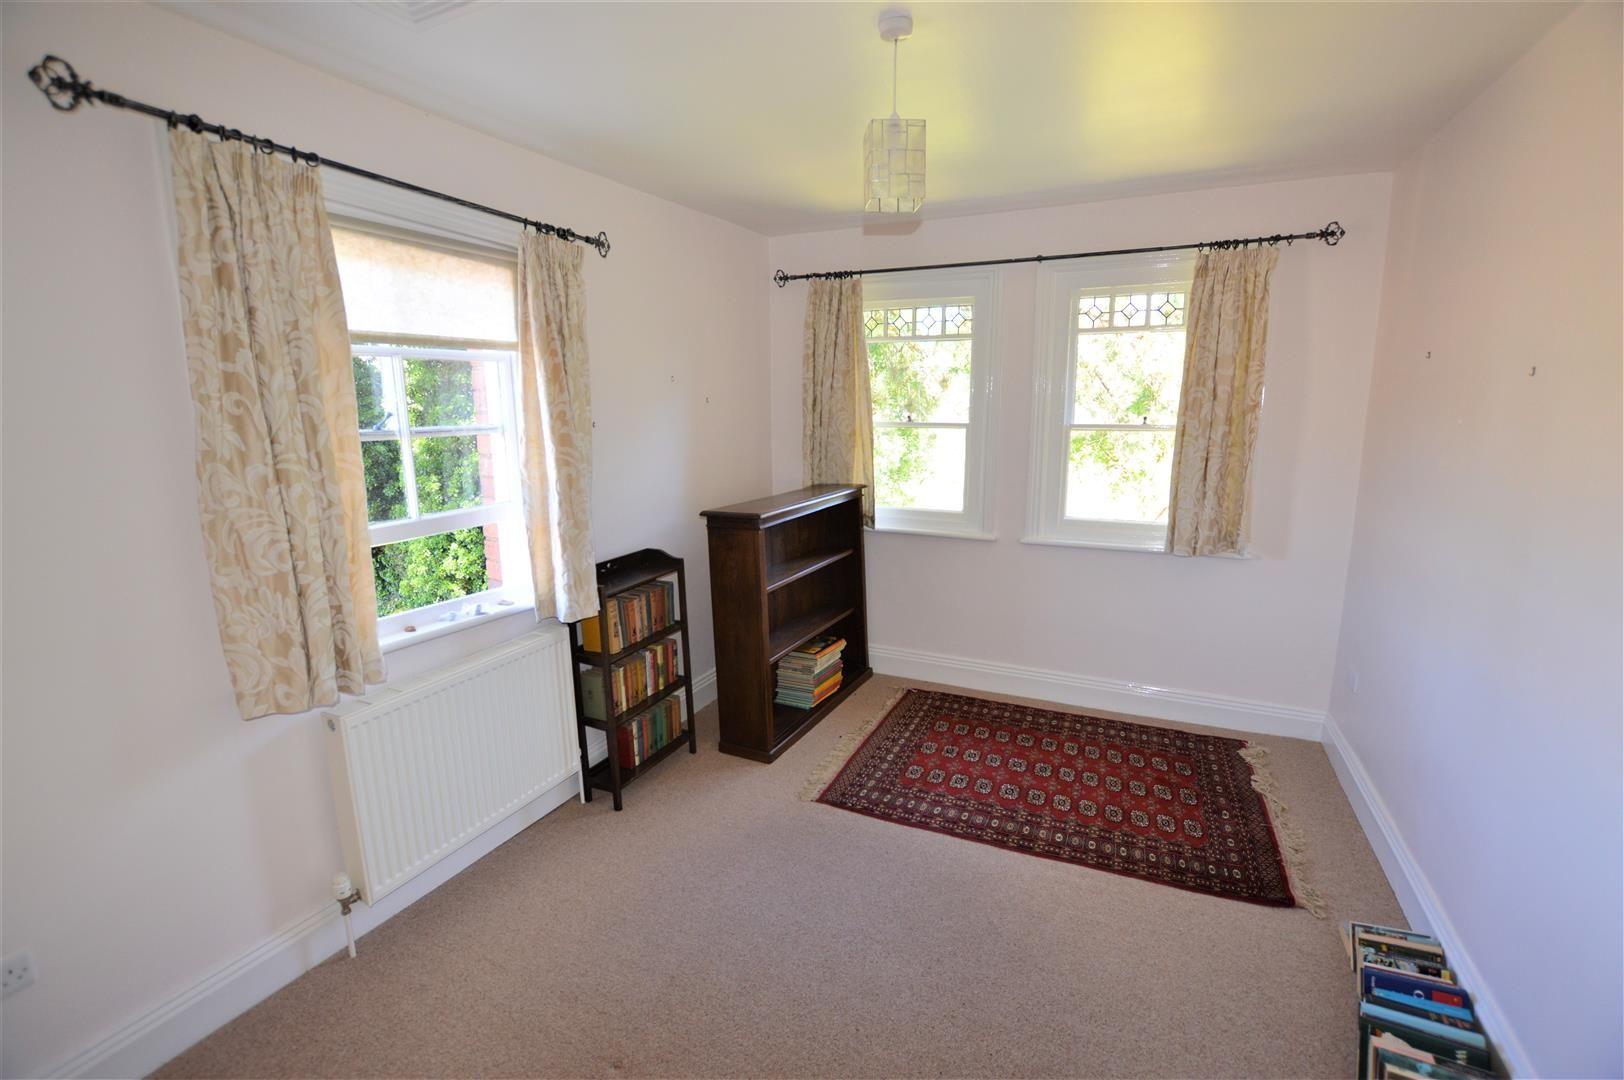 4 bed semi-detached for sale in Etnam Street, Leominster  - Property Image 8